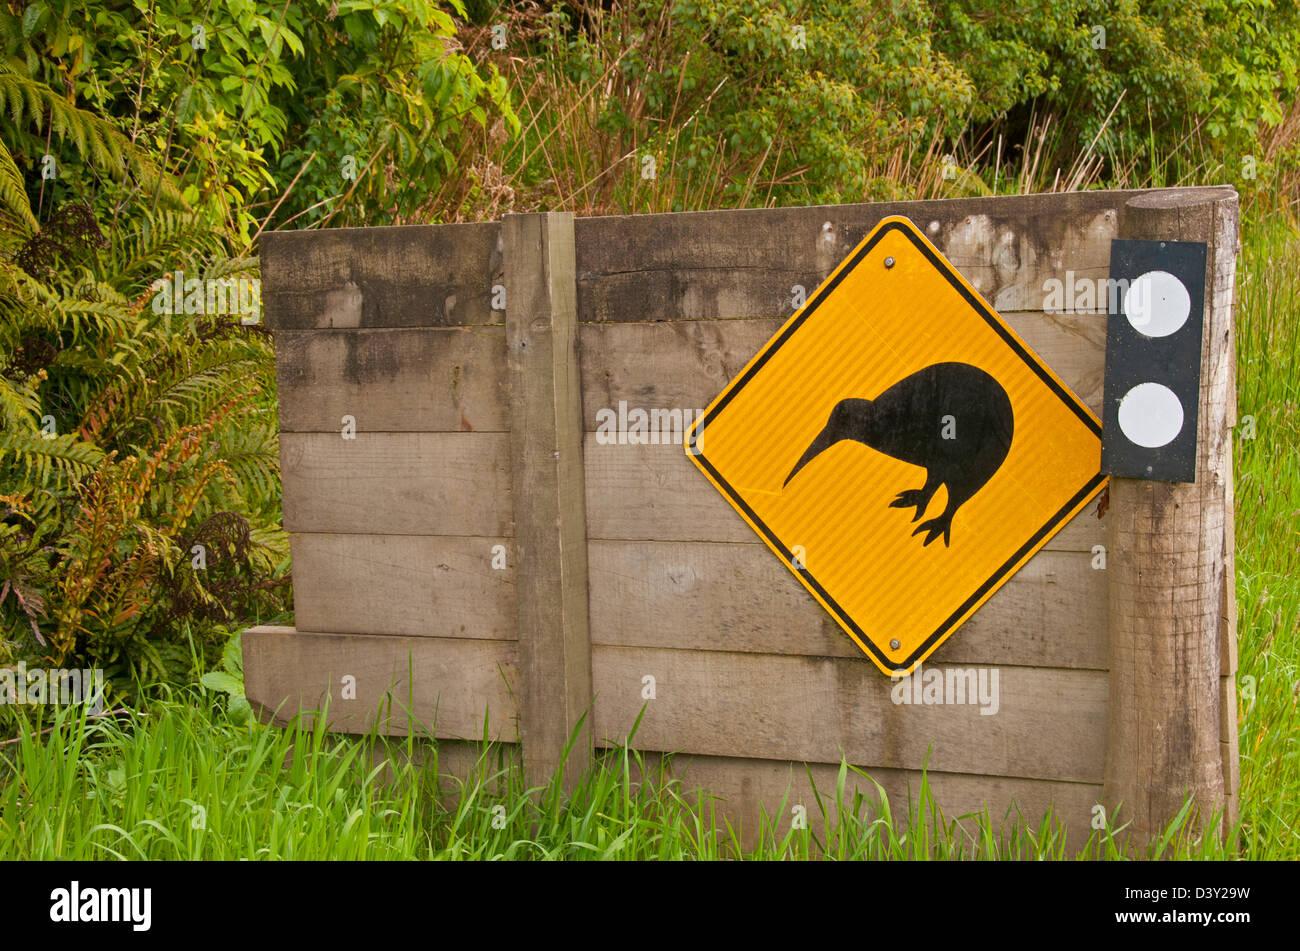 Kiwi crossing sign Invercargill, New Zealand - Stock Image